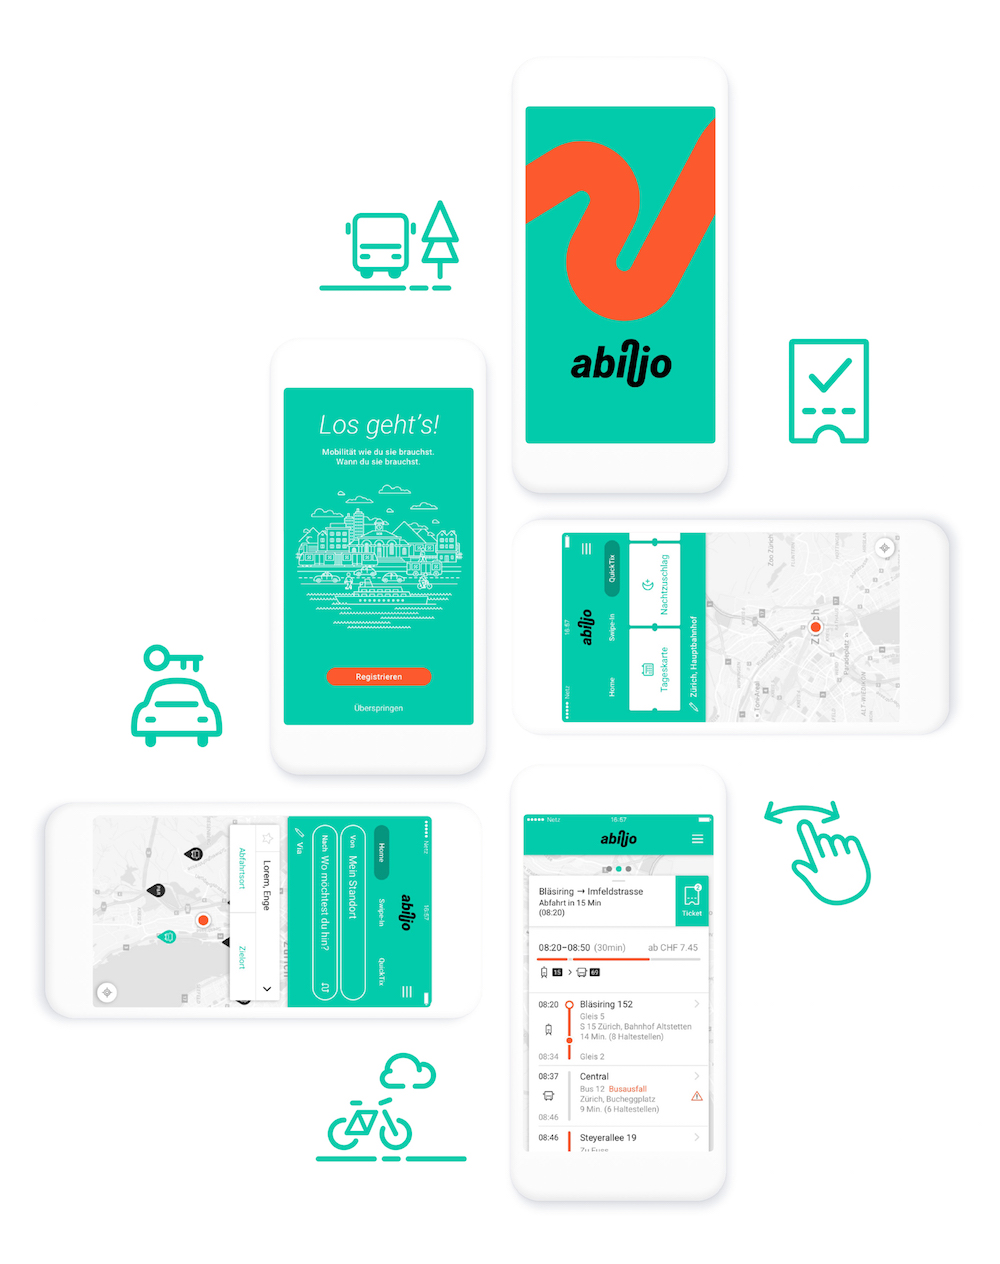 bloom identity digitaler brand f r vision re reise app werbung. Black Bedroom Furniture Sets. Home Design Ideas